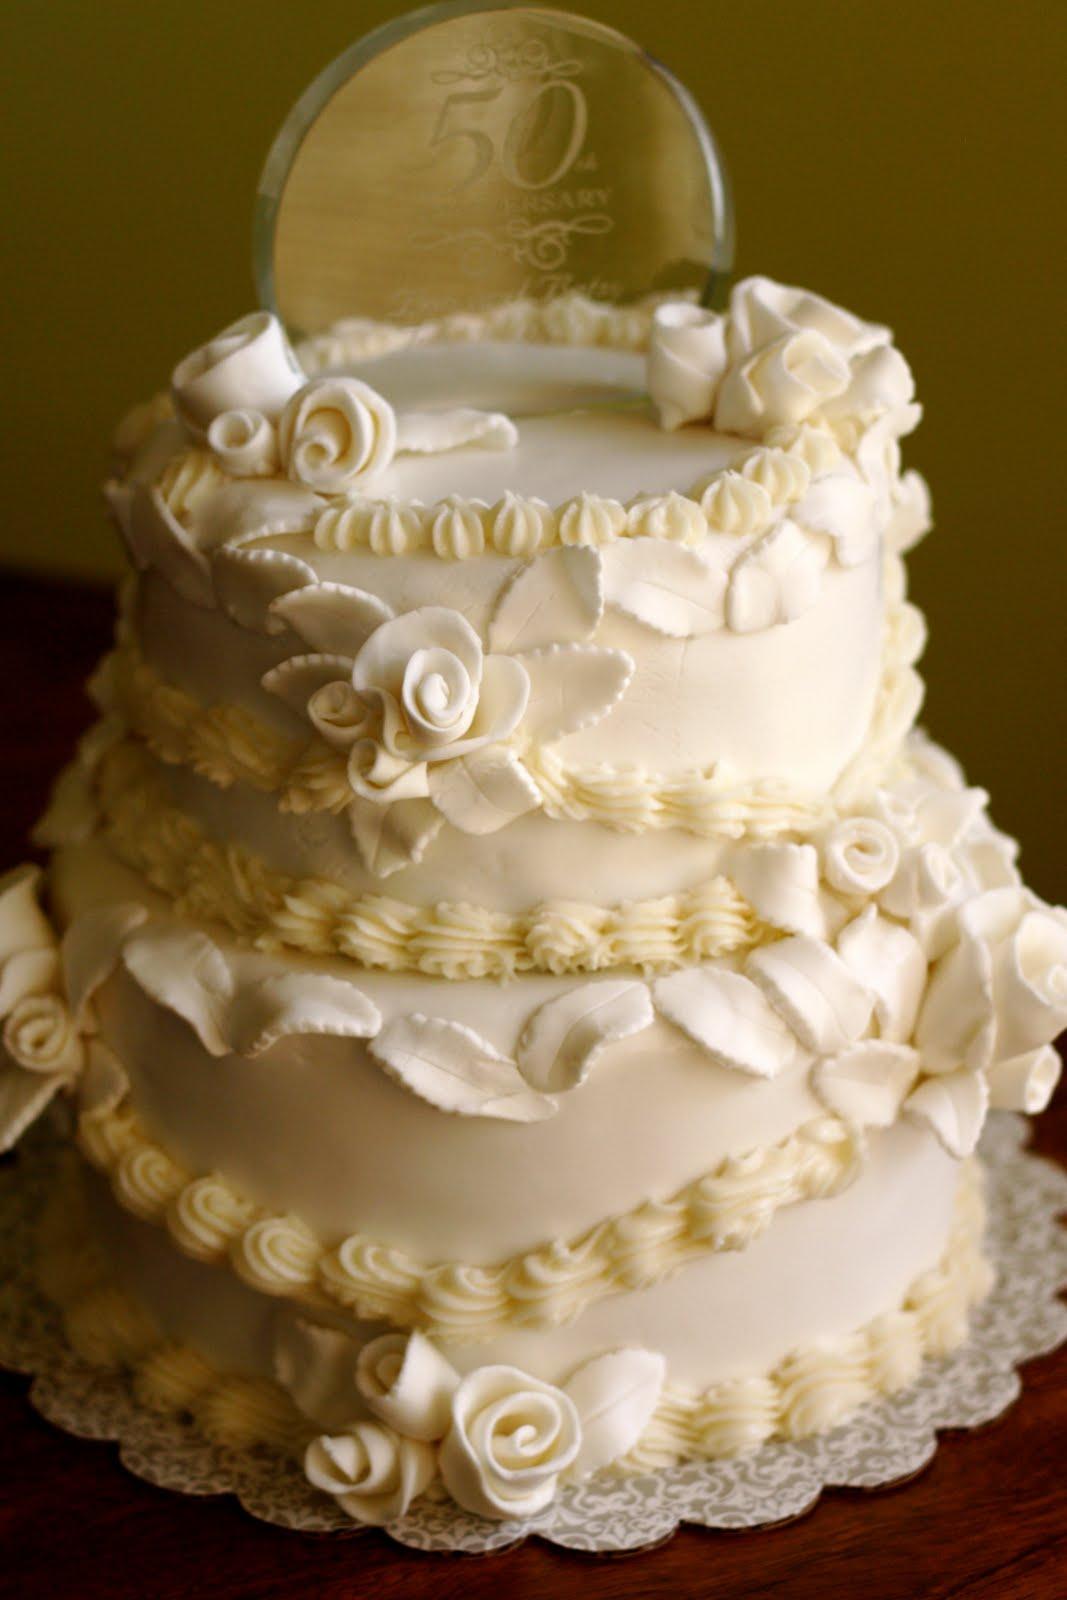 5oth wedding anniversary gift ideas